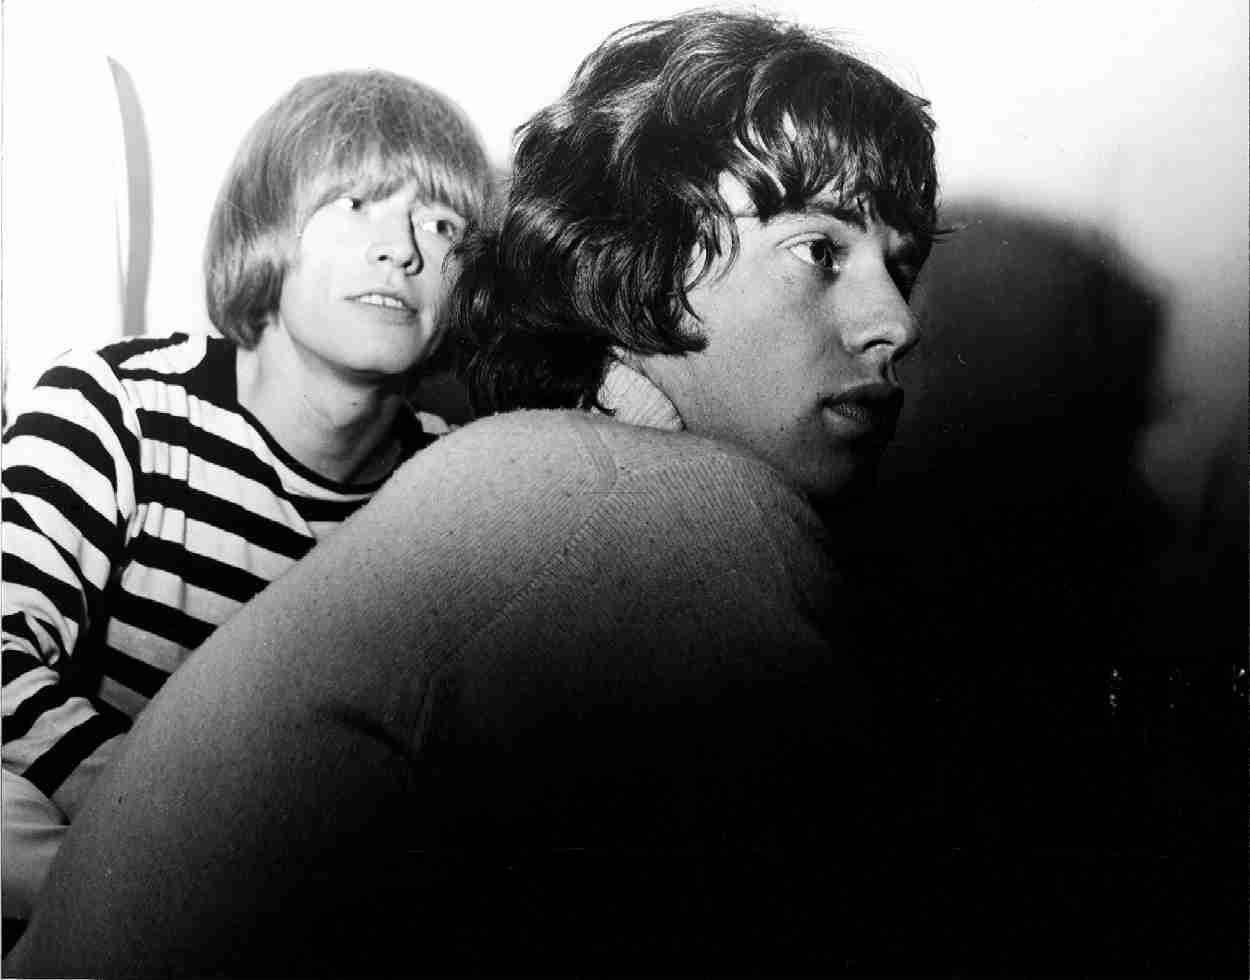 Brian Jones and Mick Jagger, Stockton on Tees, England 1965